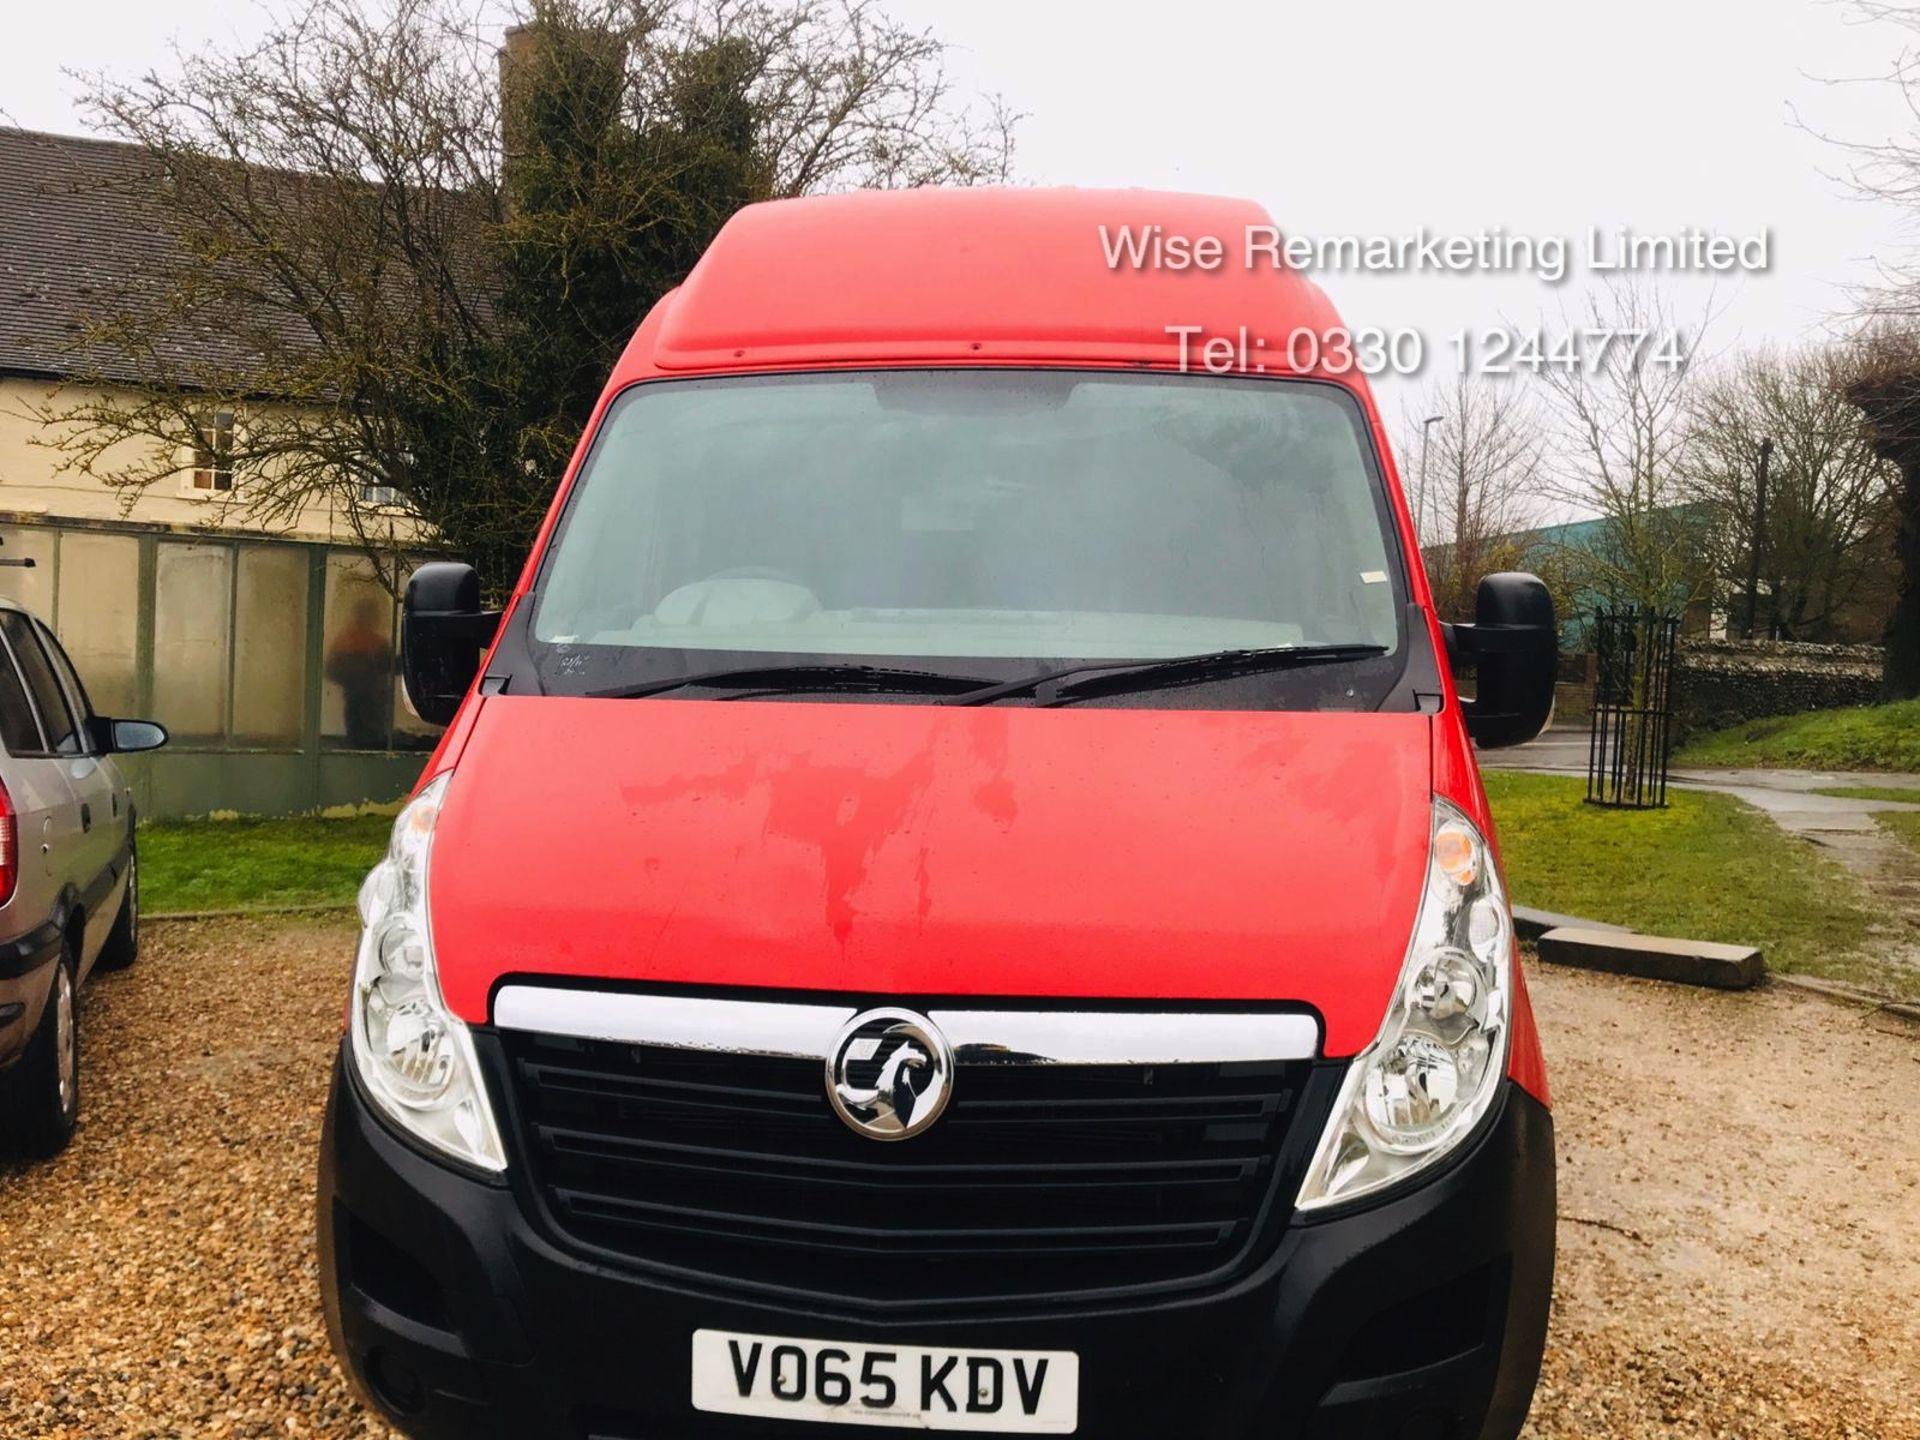 Lot 13 - Vauxhall Movano 35 2.3 CDTi BiTurbo EcoFlex **HIGH ROOF** 2016 Model - AIr con - 1 Owner - RARE